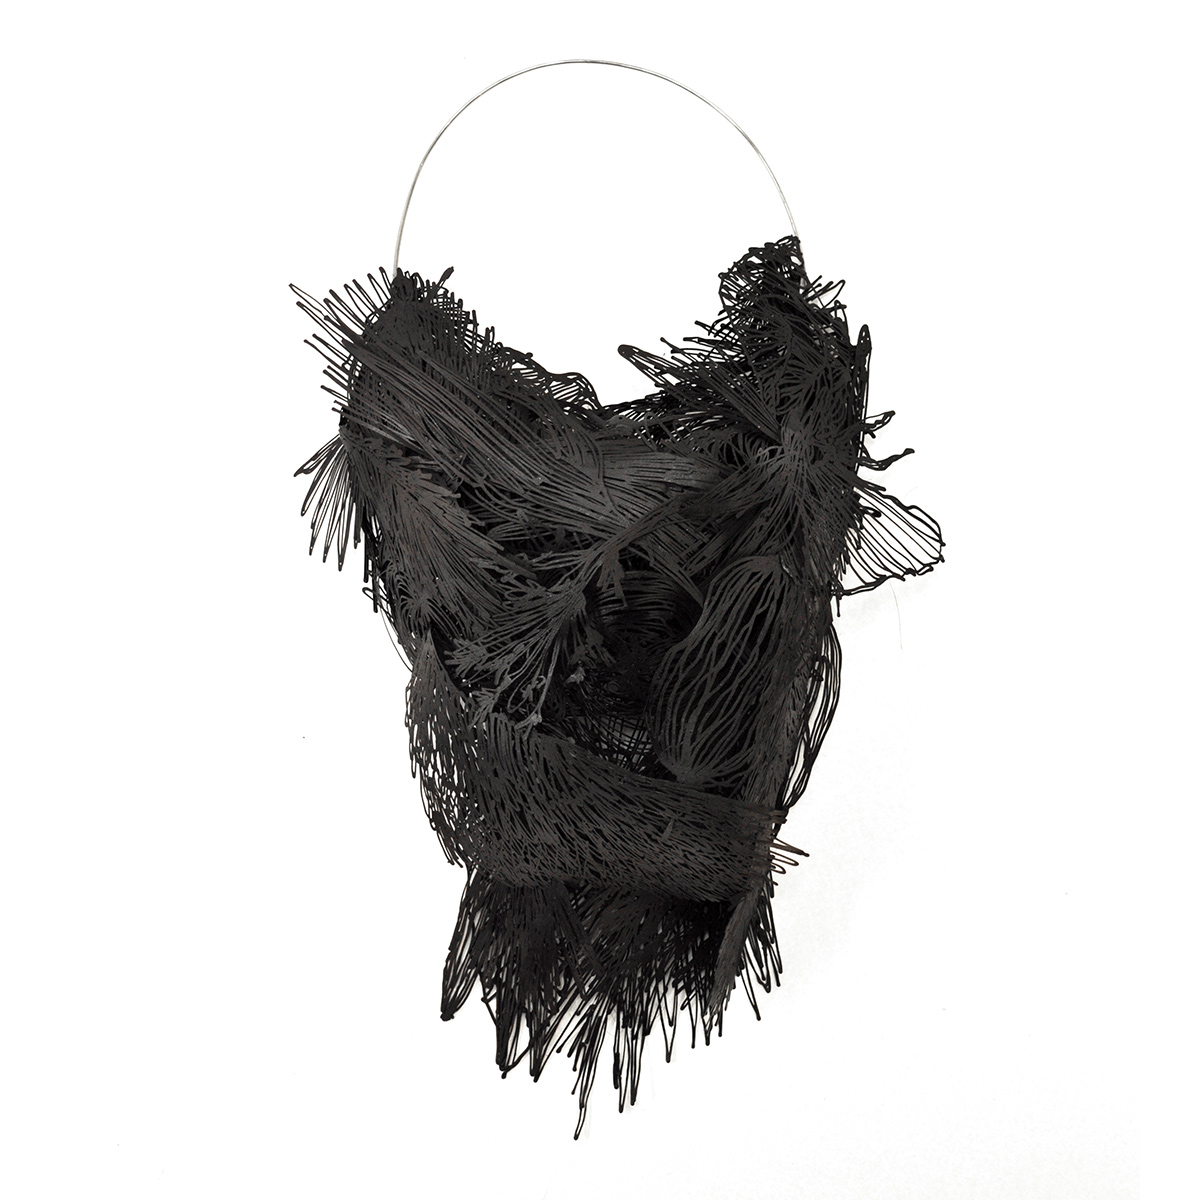 Sofia Björkman, What has the bird done?, halssieraad, 2016, metaal, staal, verf